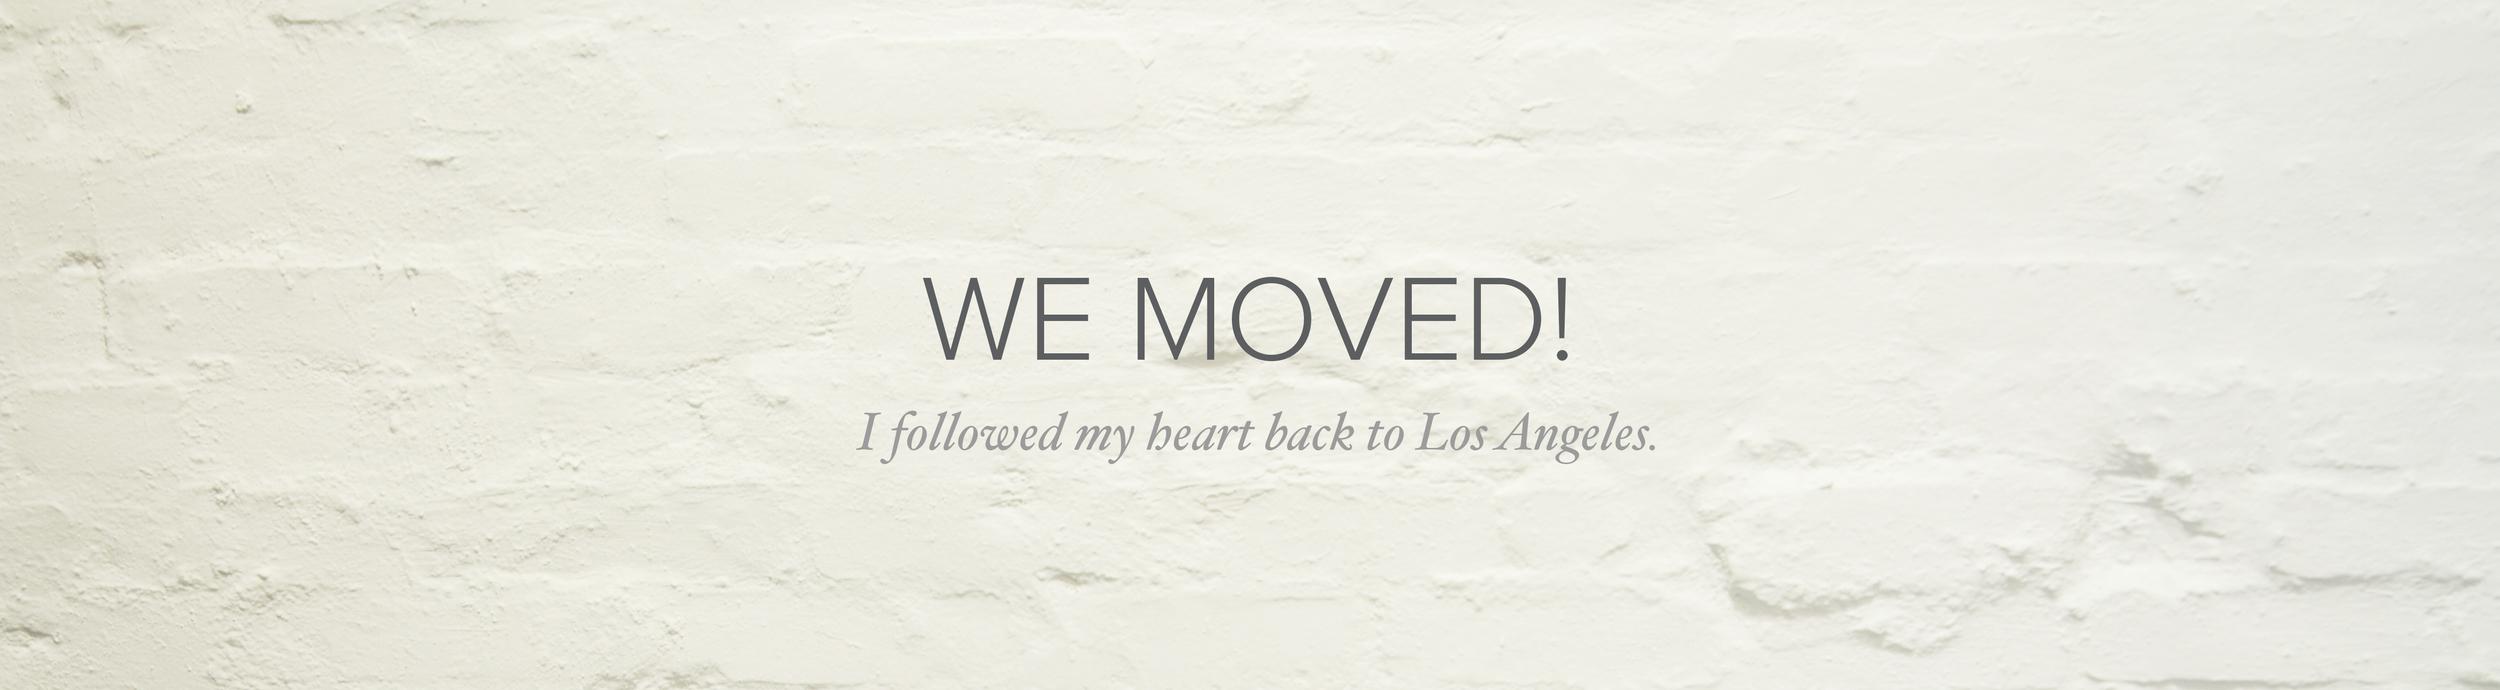 we moved-website.jpg